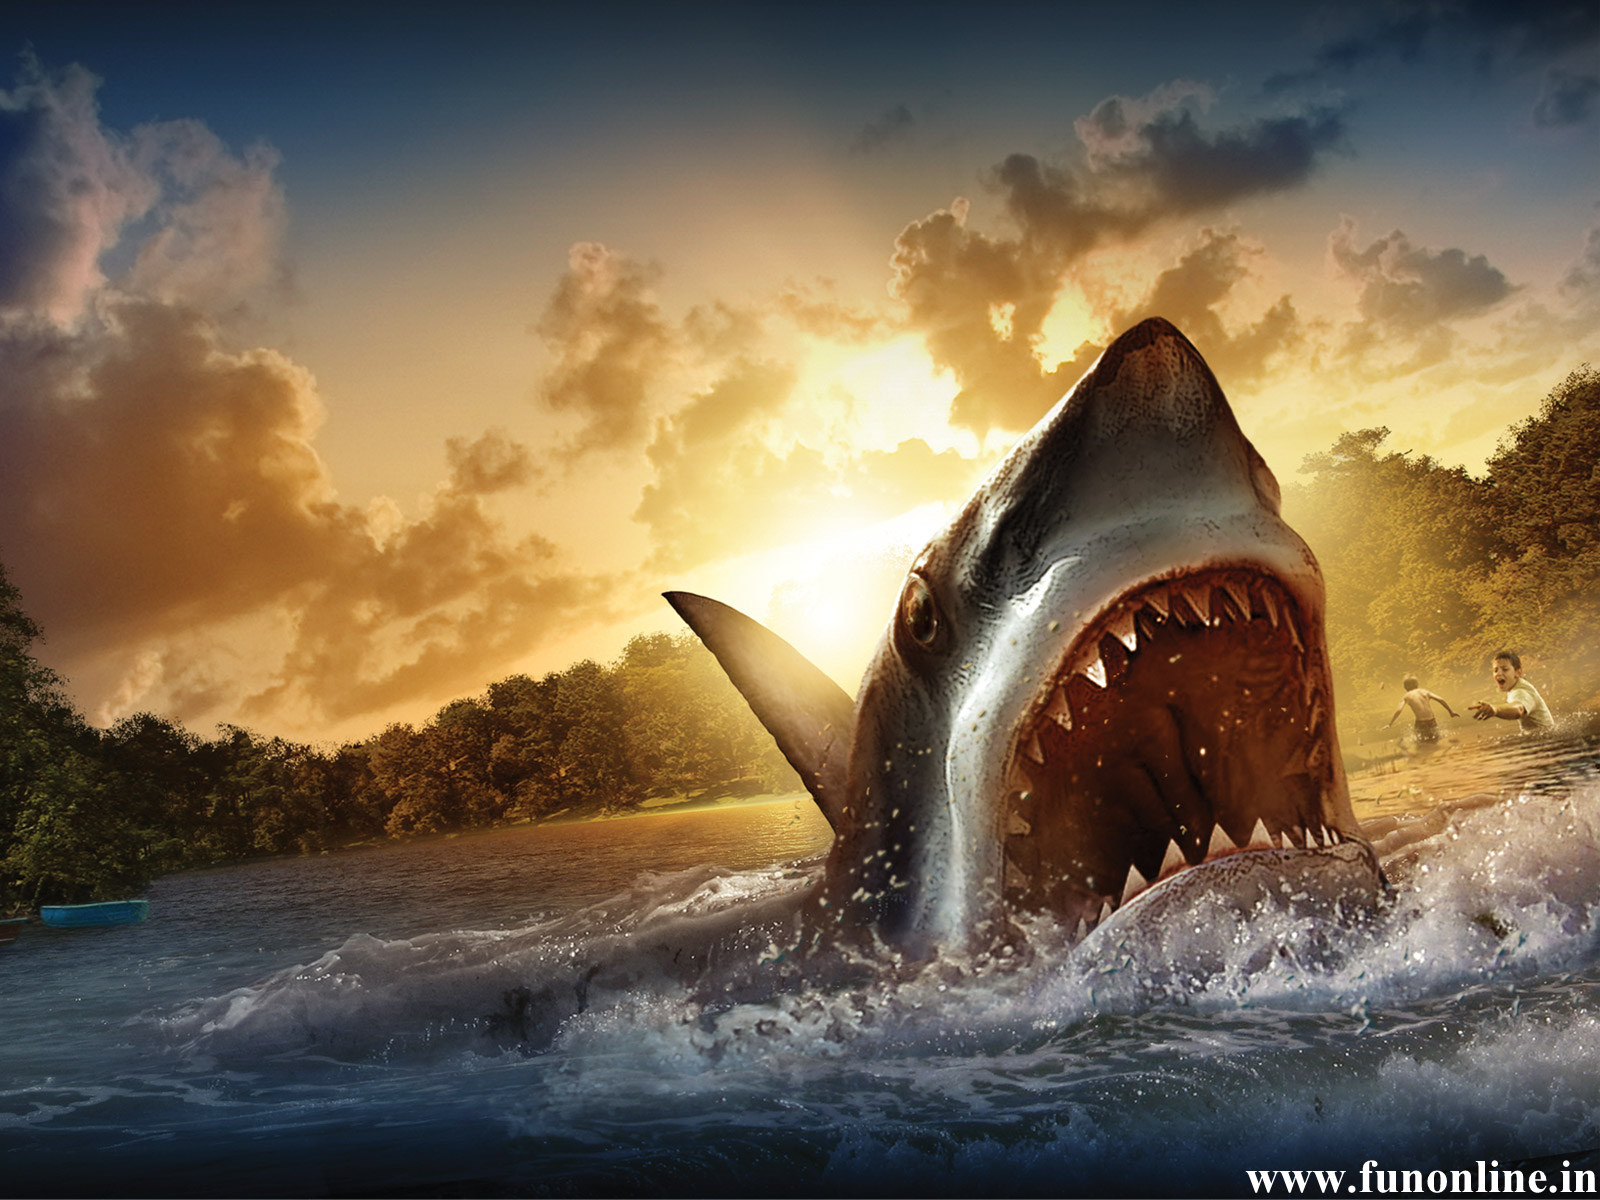 68 Great White Shark Wallpaper Hd On Wallpapersafari